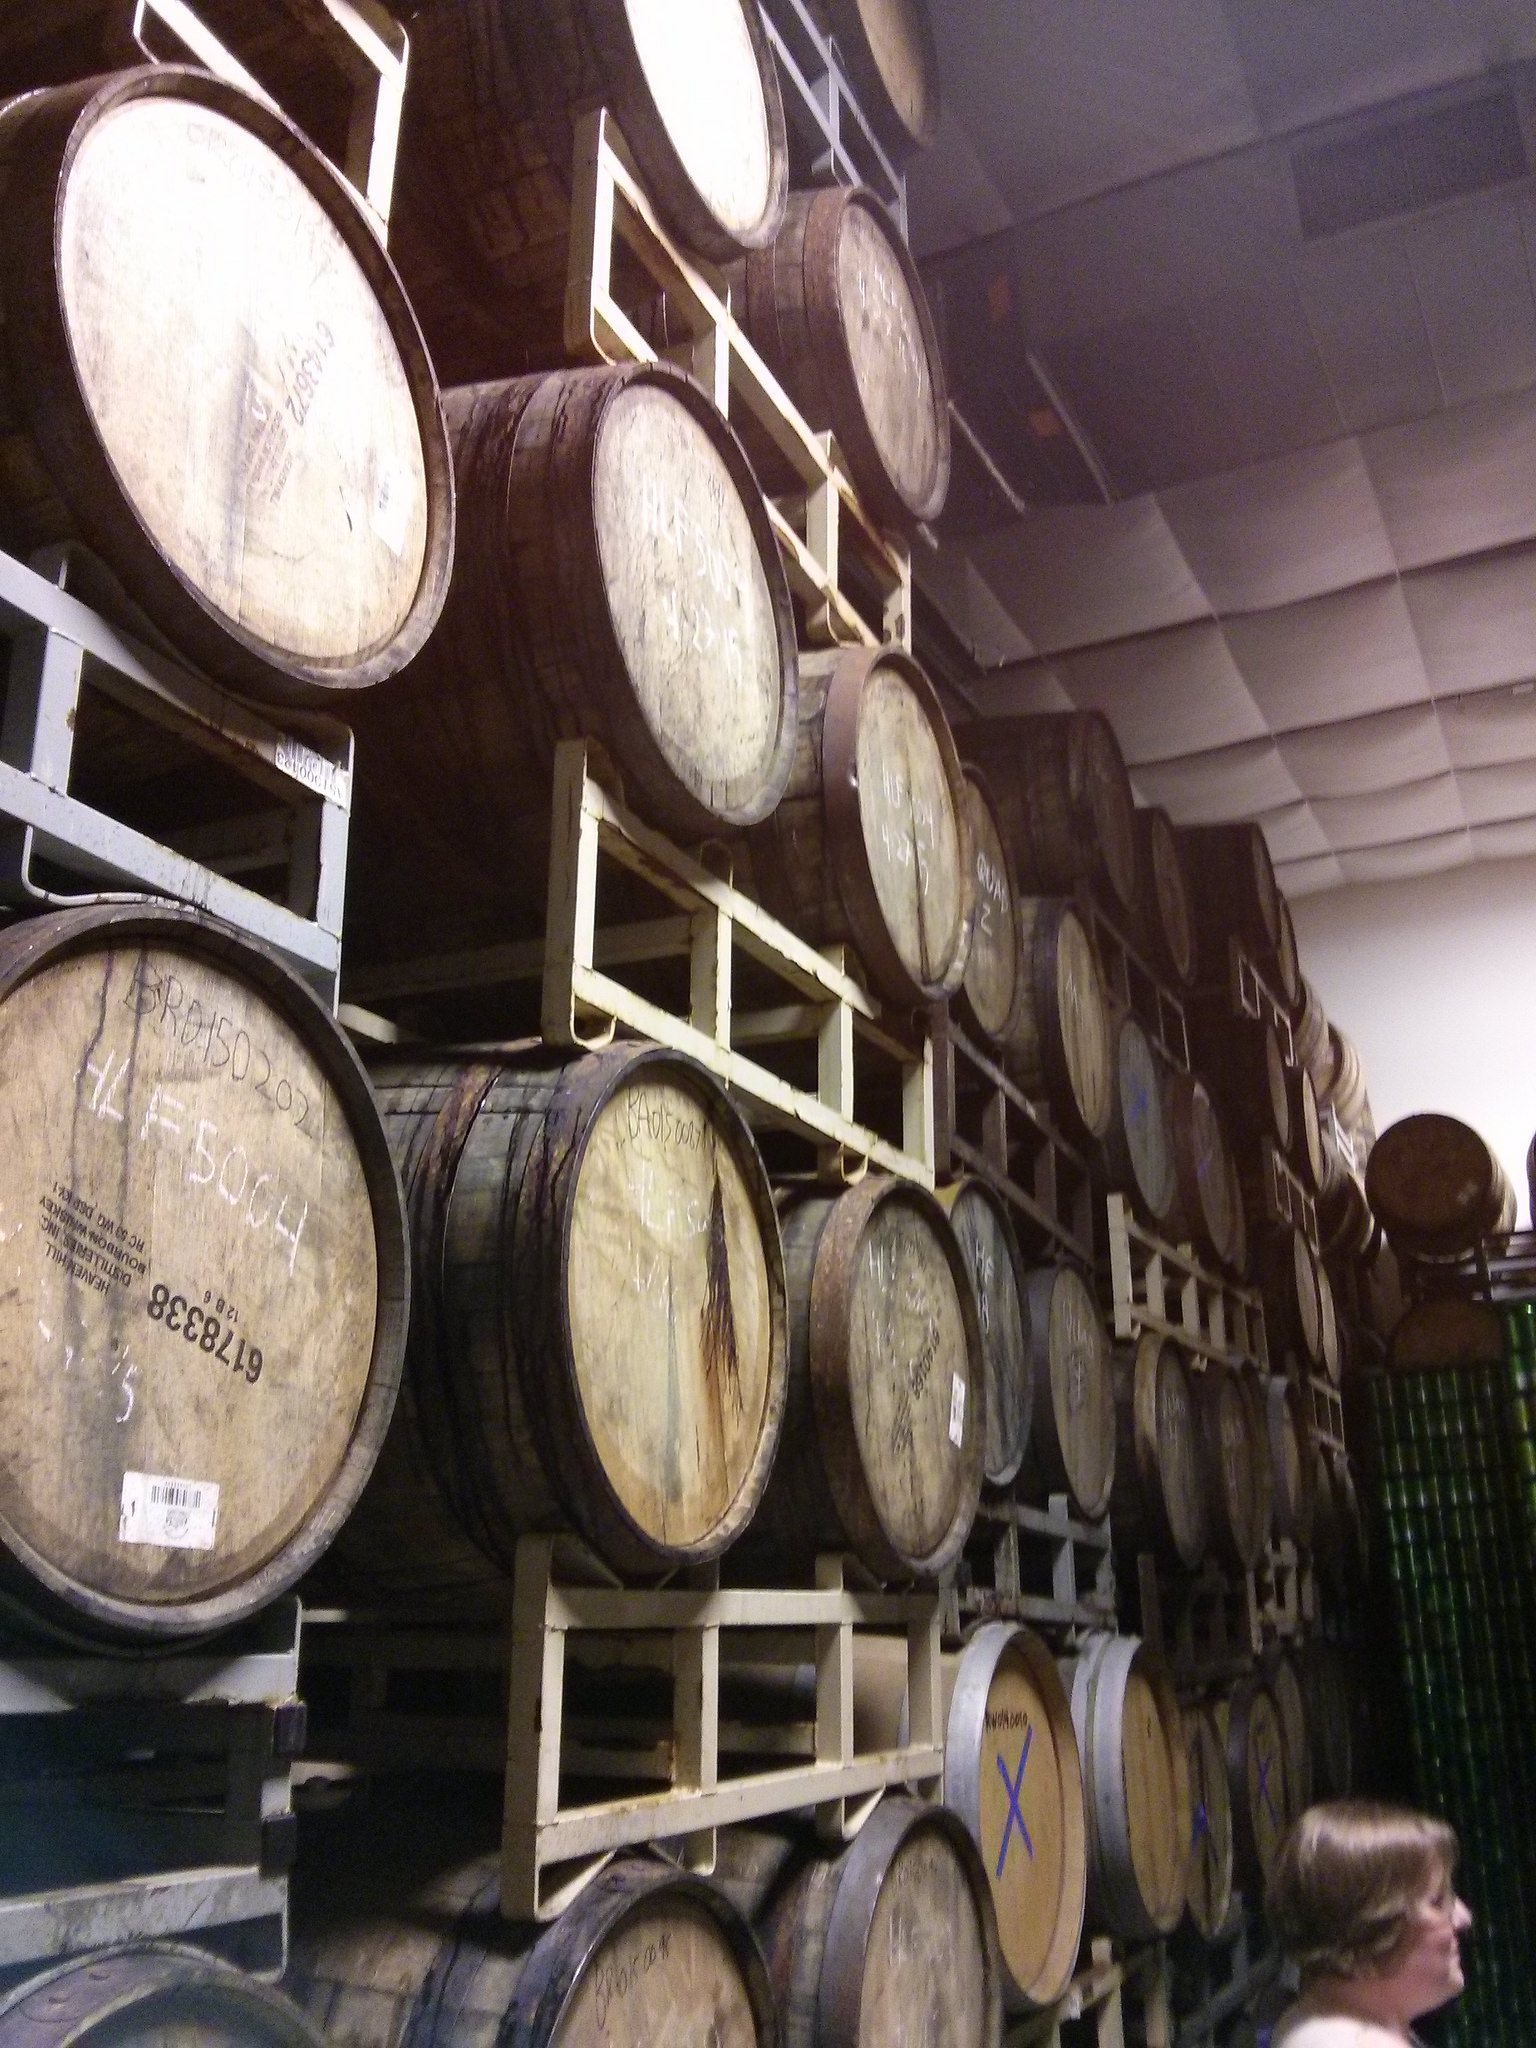 Karbach Brewing | © Charles Pence/Flickr